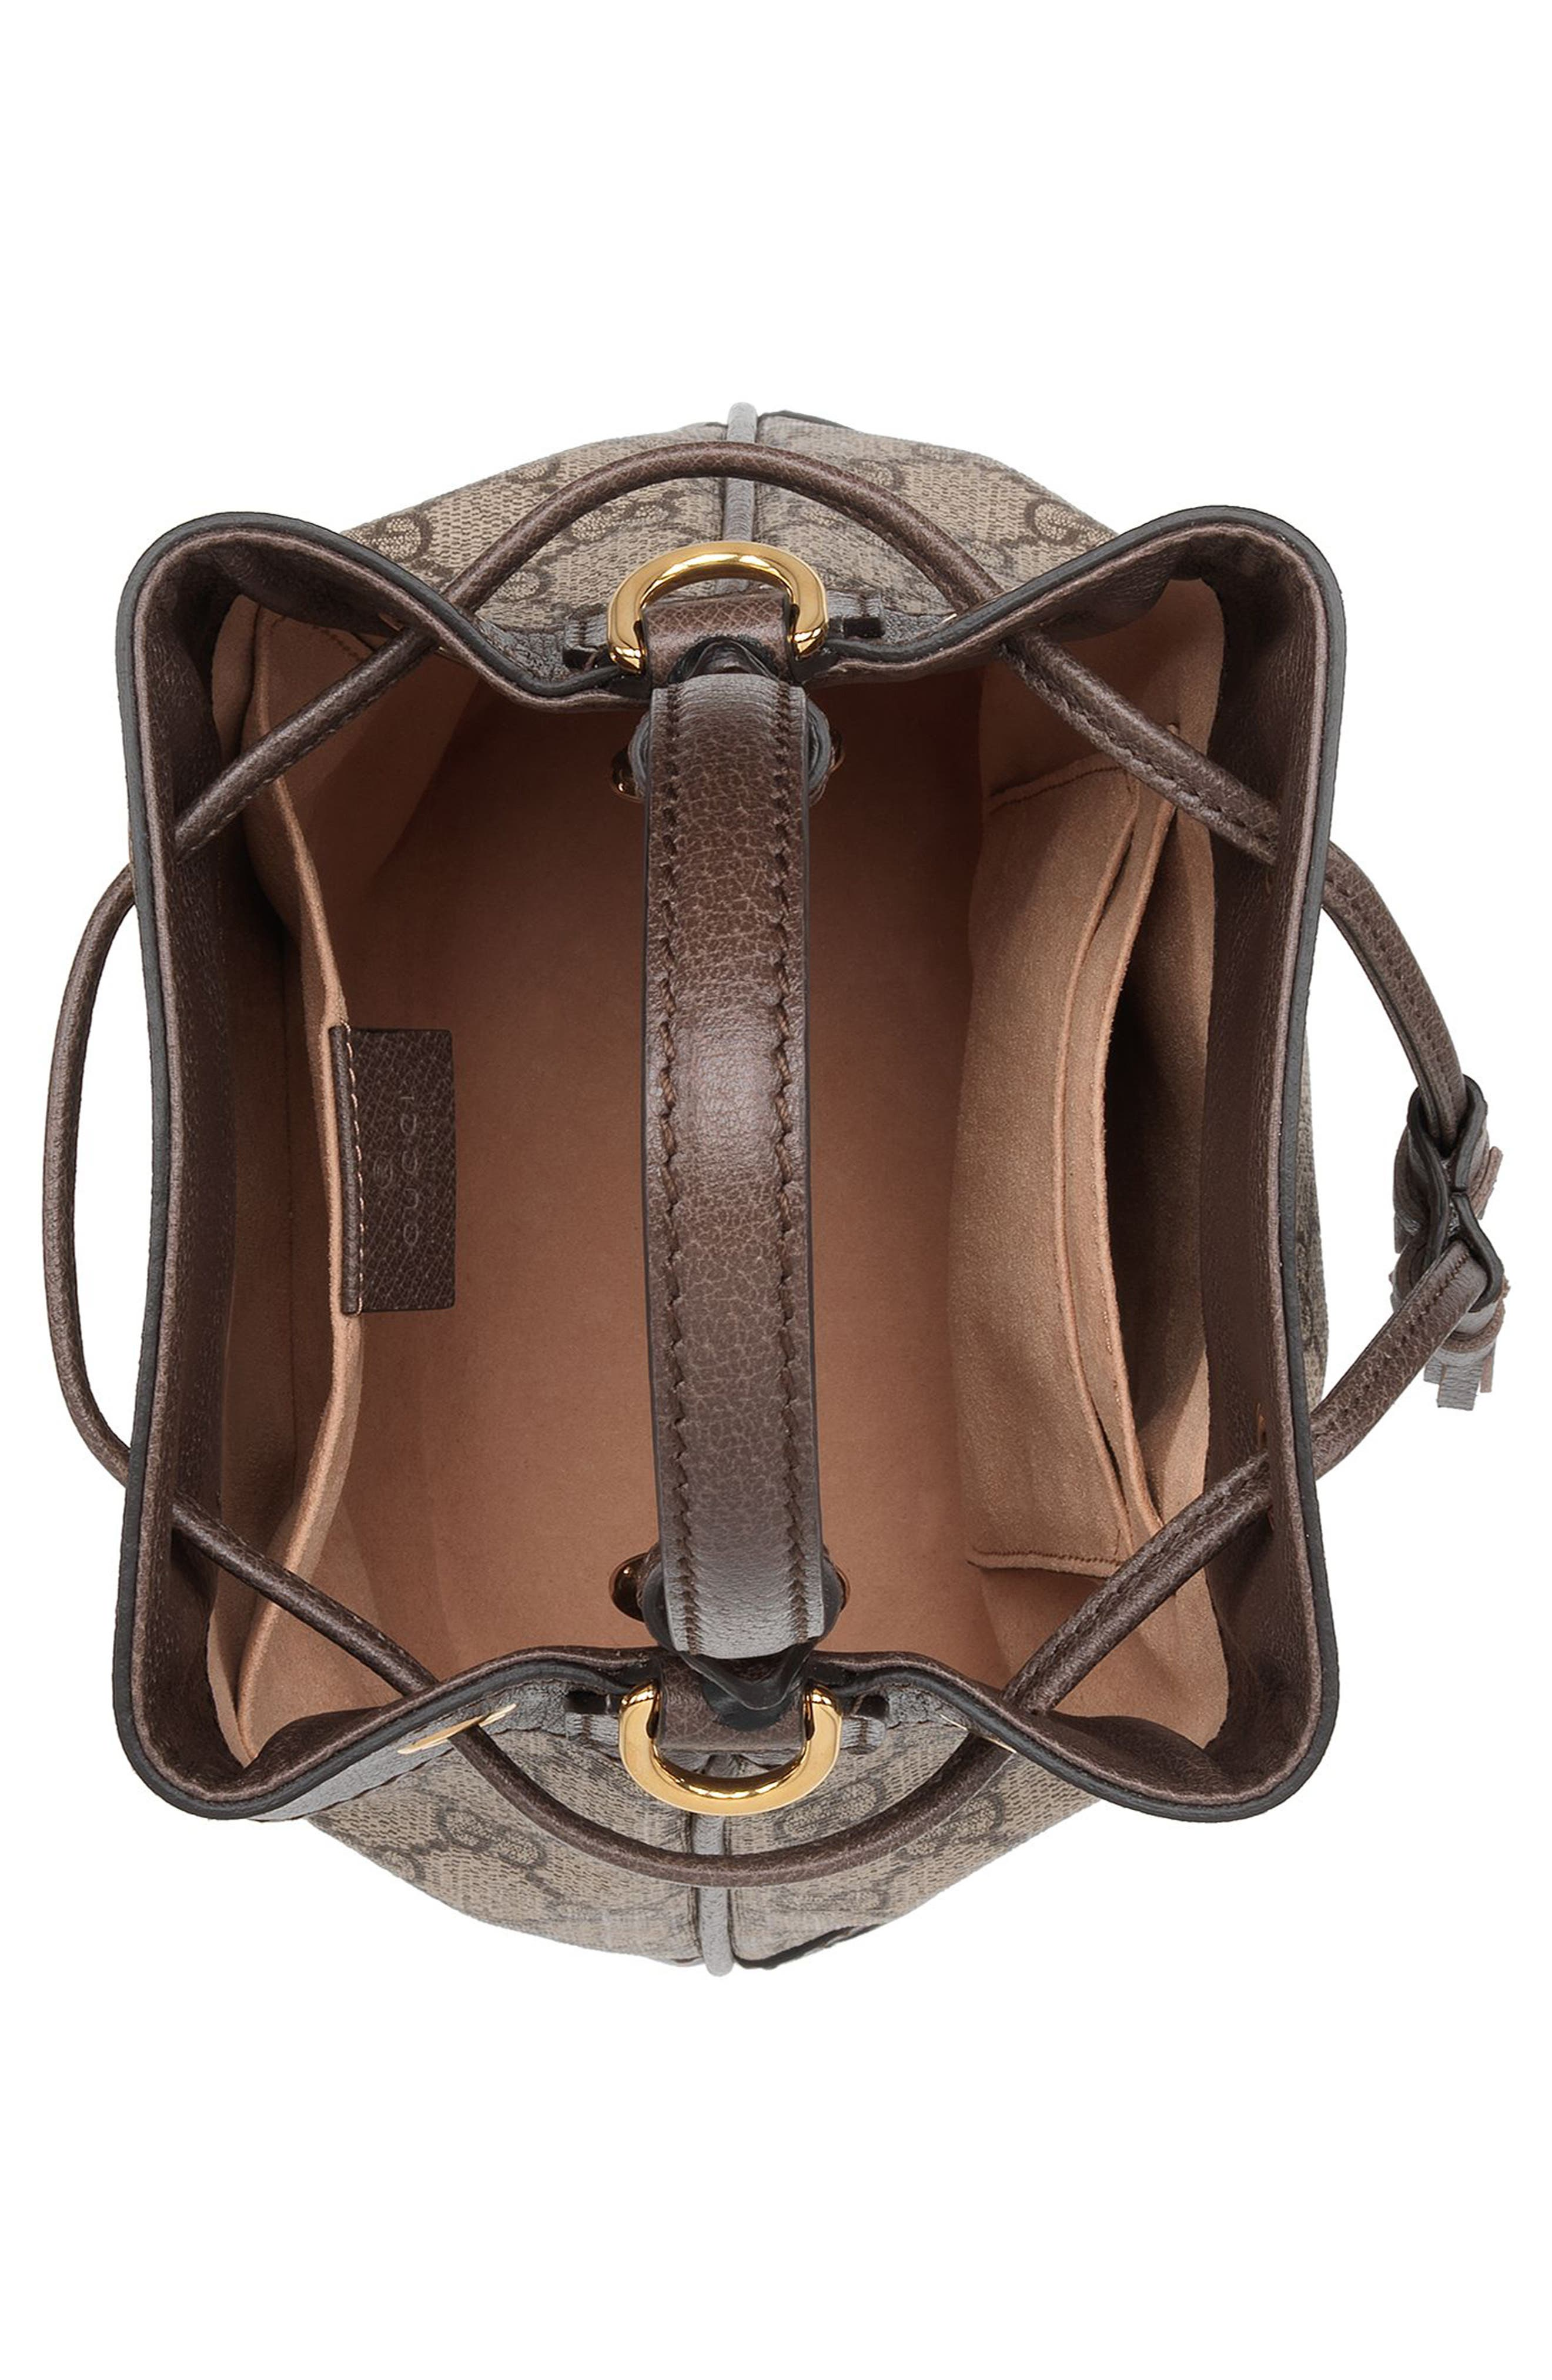 Small Ophidia GG Supreme Canvas Bucket Bag,                             Alternate thumbnail 3, color,                             BEIGE EBONY/ NEW ACERO